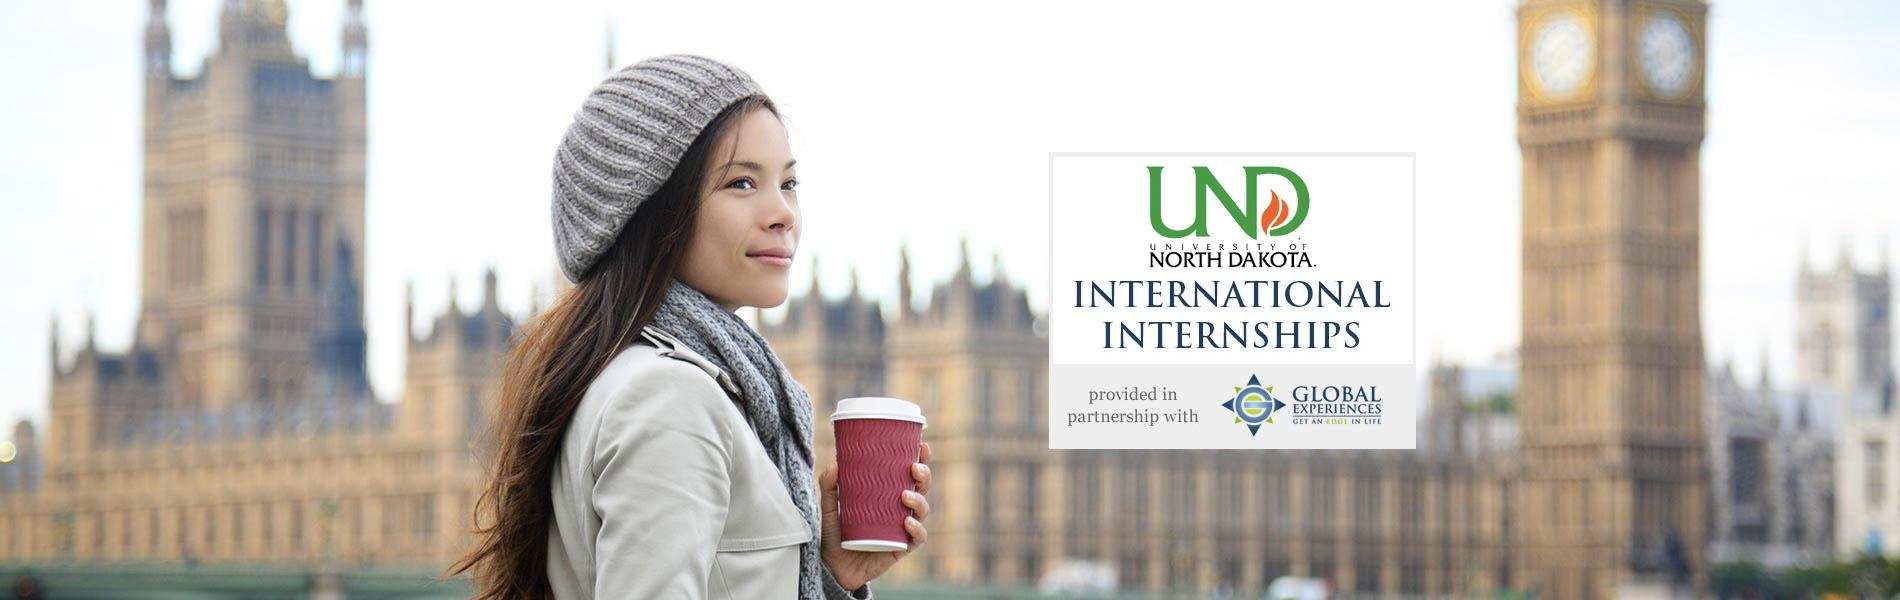 University of North Dakota Intern Abroad